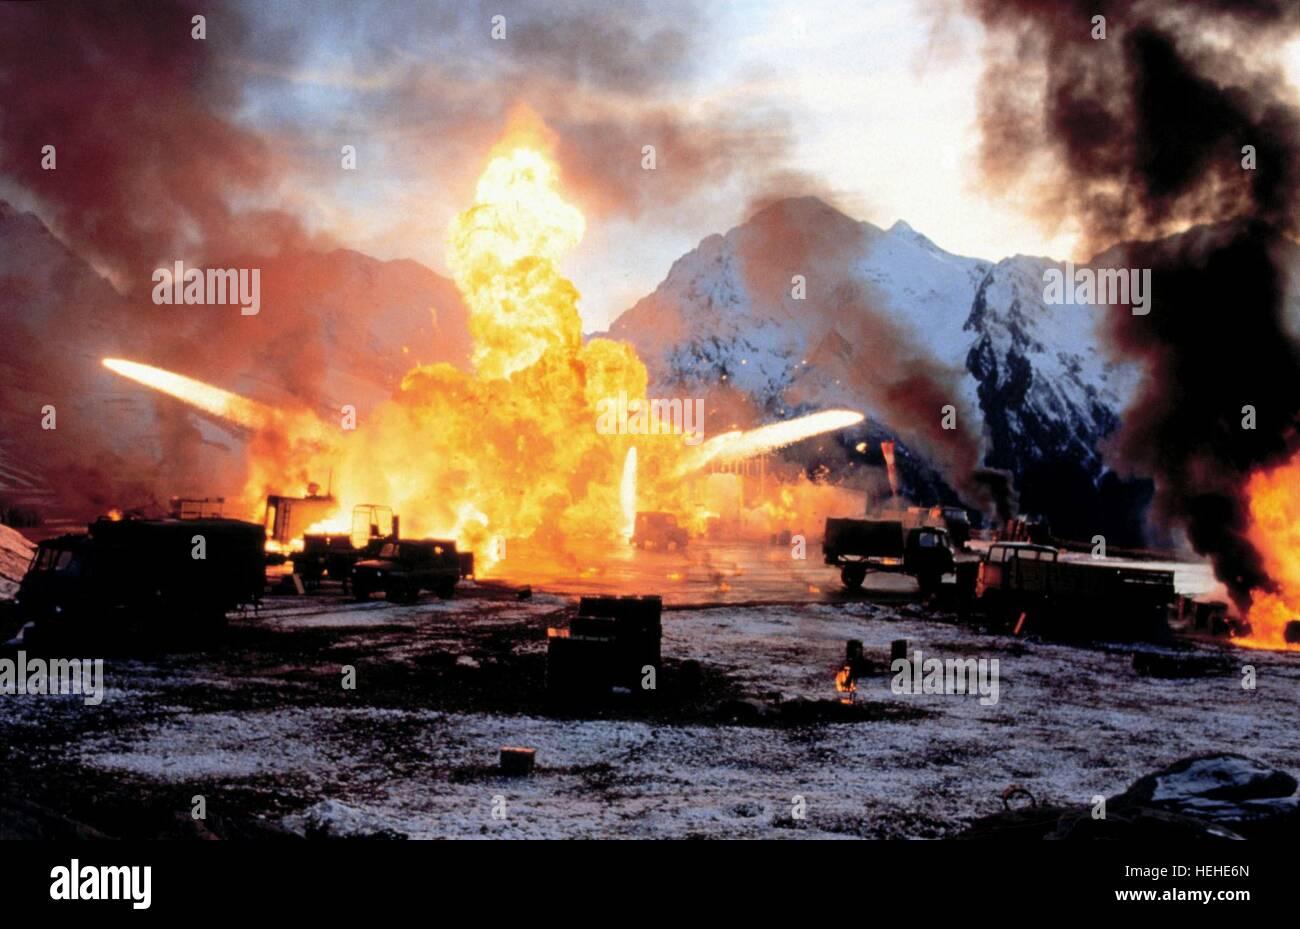 AIRFIELD EXPLOSION JAMES BOND: TOMORROW NEVER DIES (1997